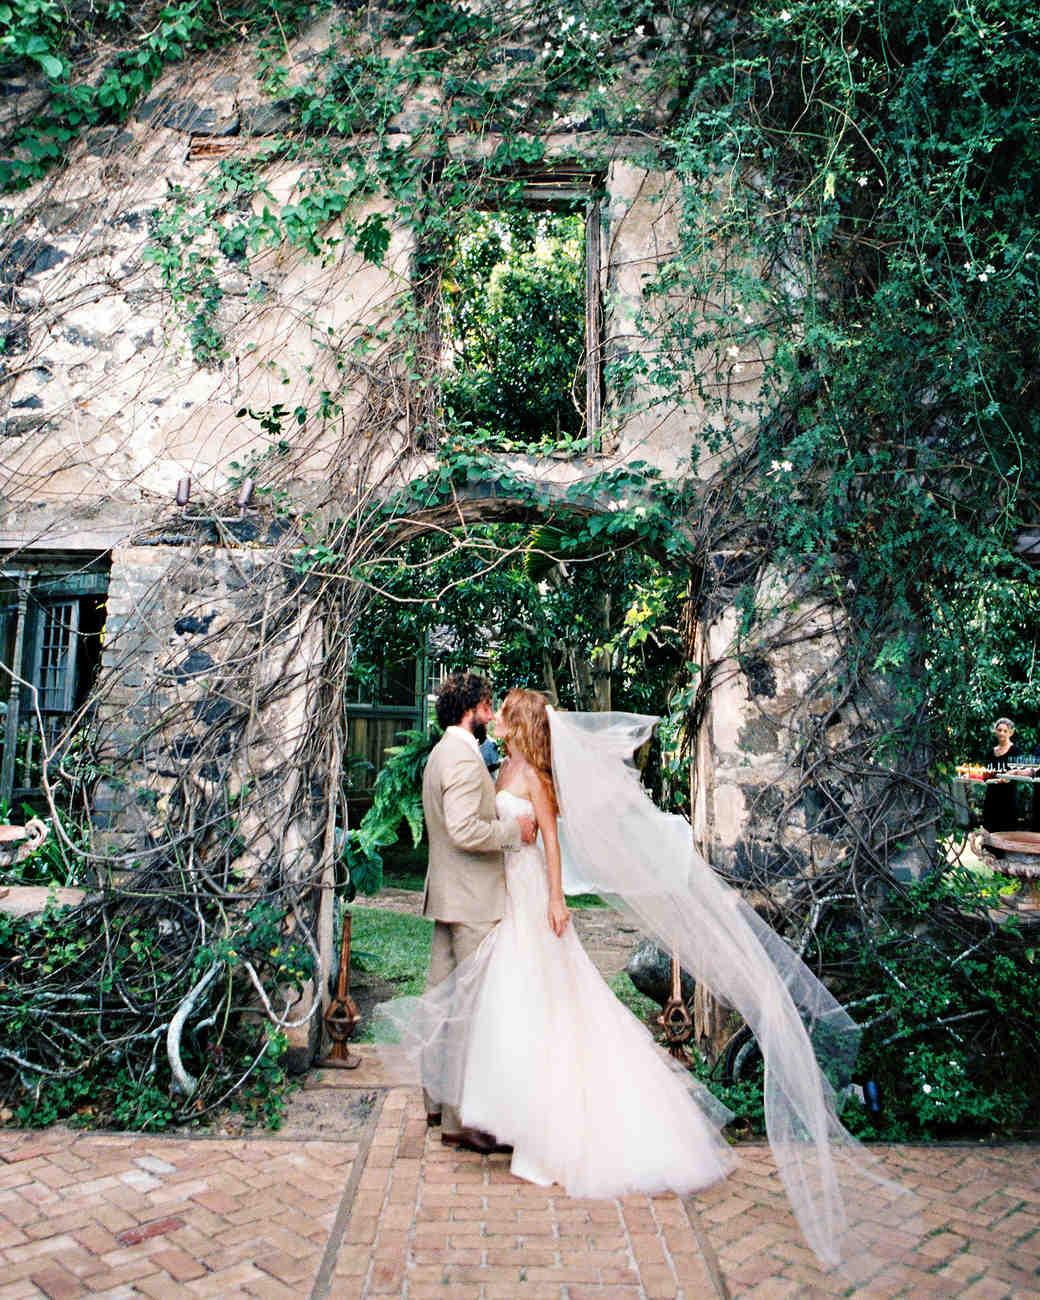 caitlin-loren-kiss-029-wds110278.jpg